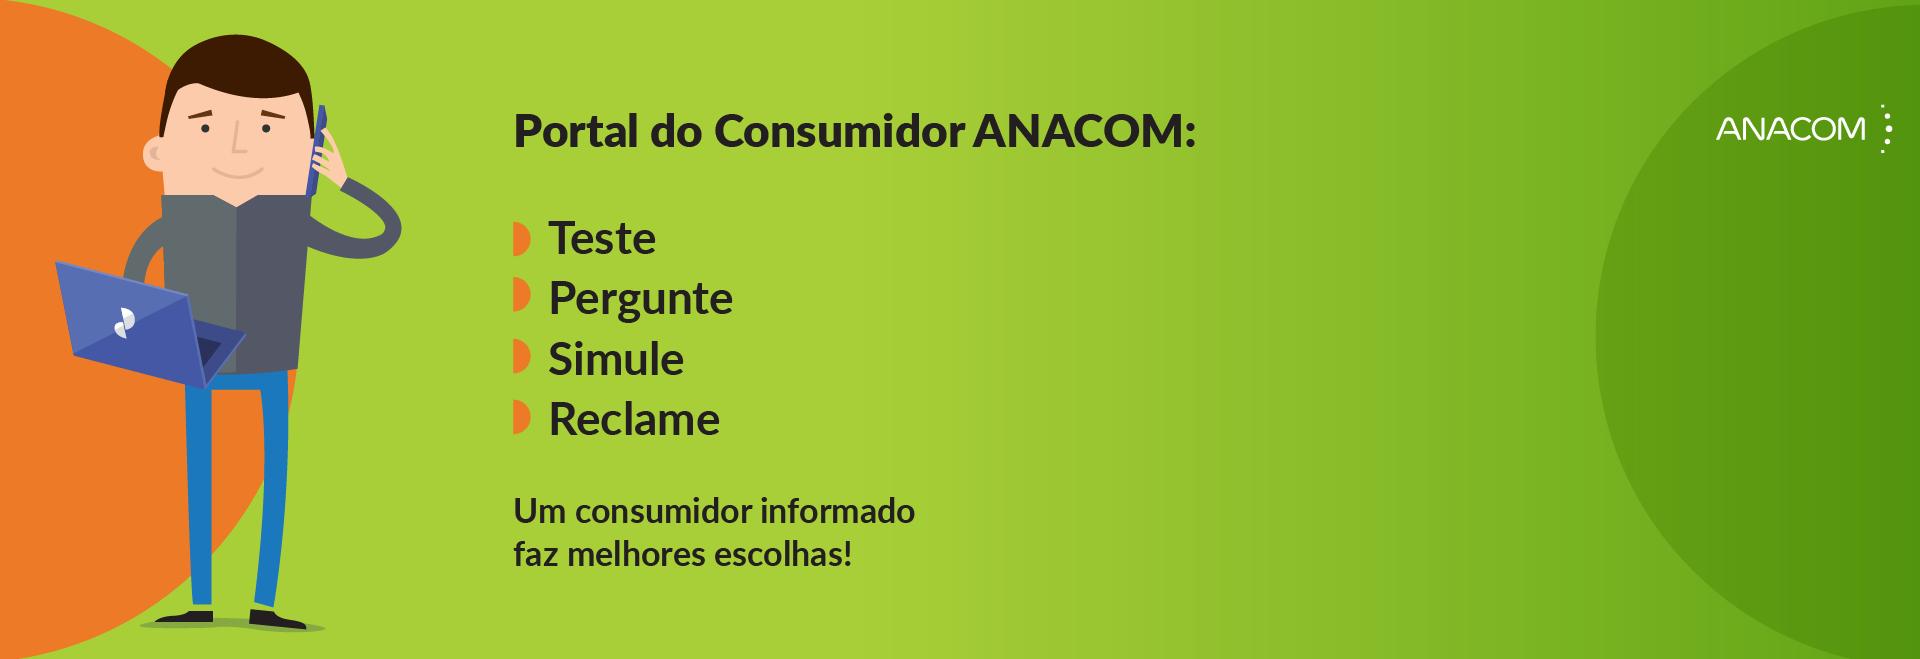 Portal do Consumidor - Portal do Consumidor